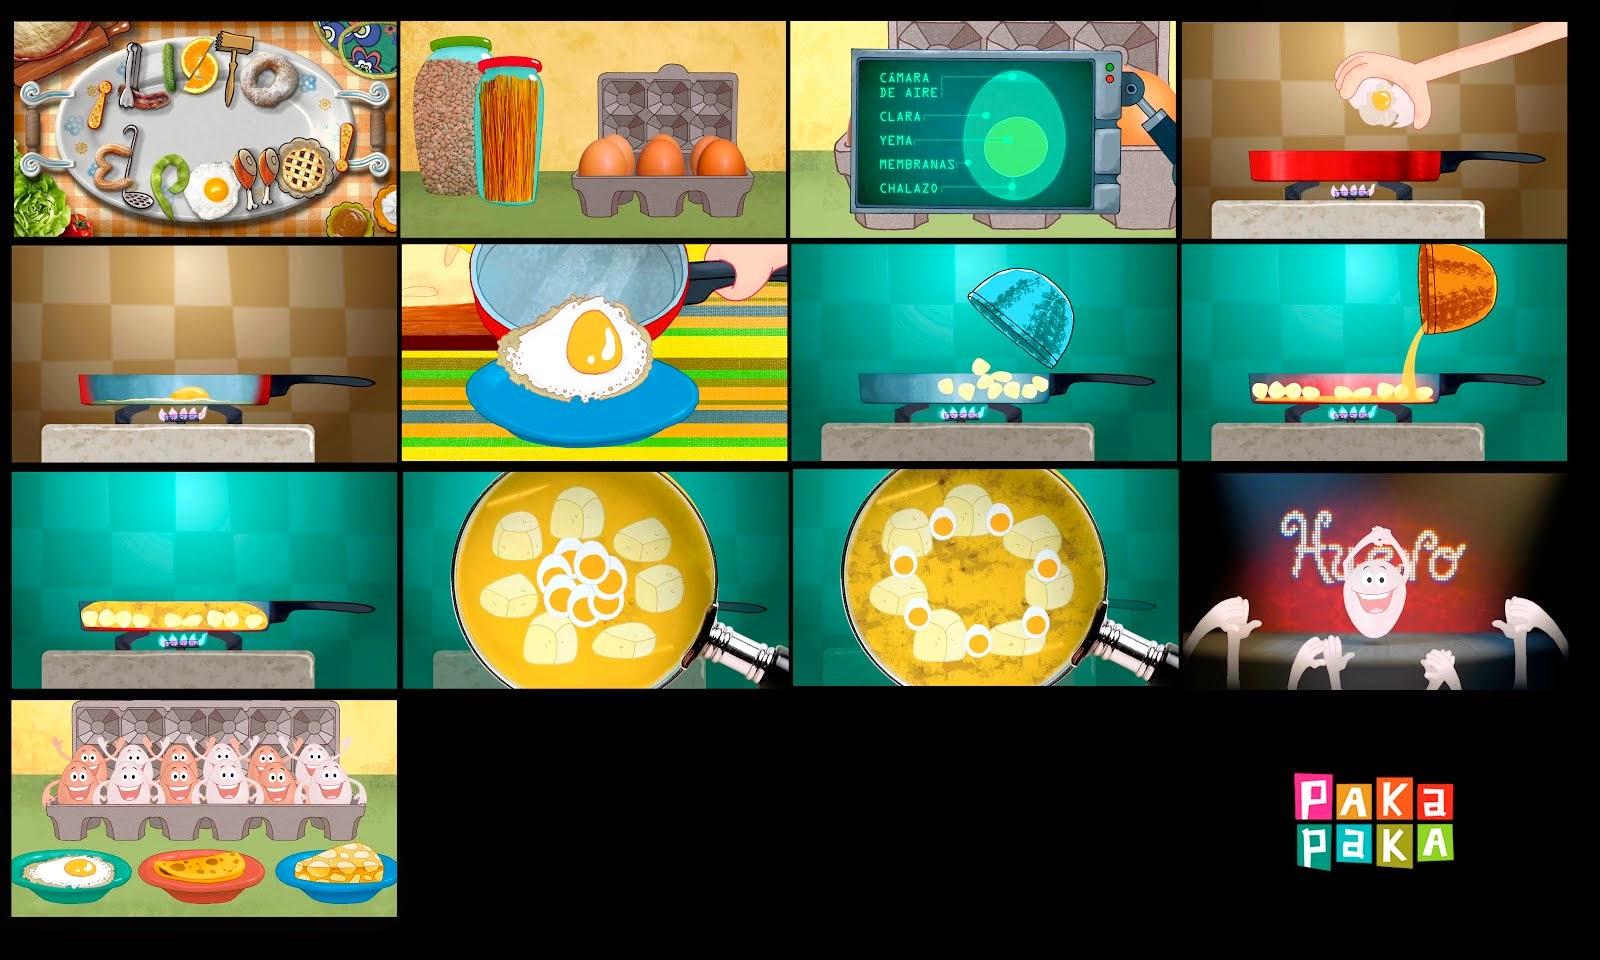 Listo el Pollo arte de las Pastillas animadas, canal Paka Paka